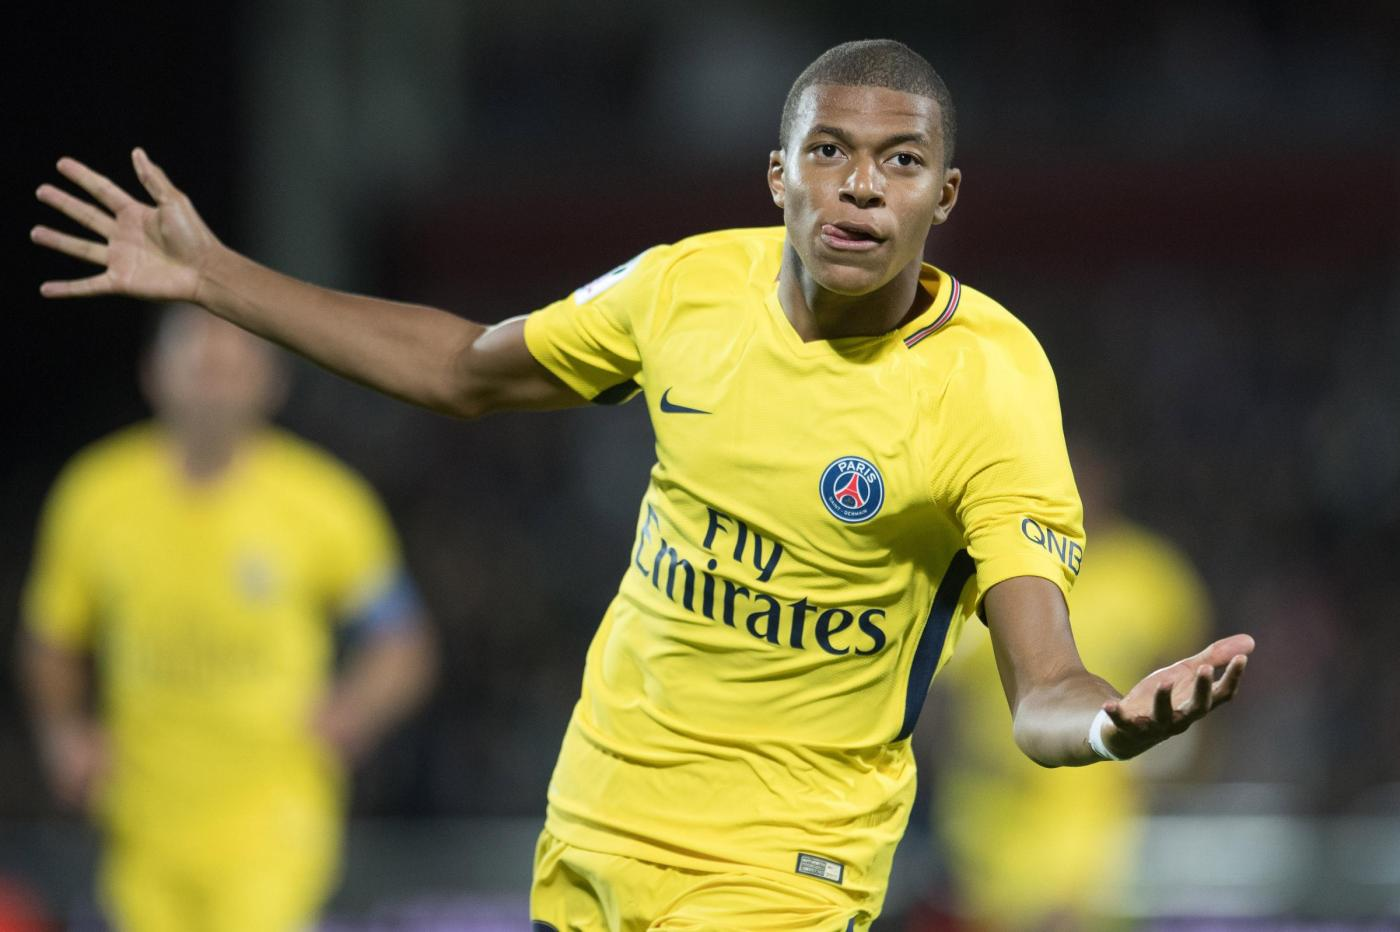 Paris SG-Angers 14 marzo, analisi e pronostico Ligue 1